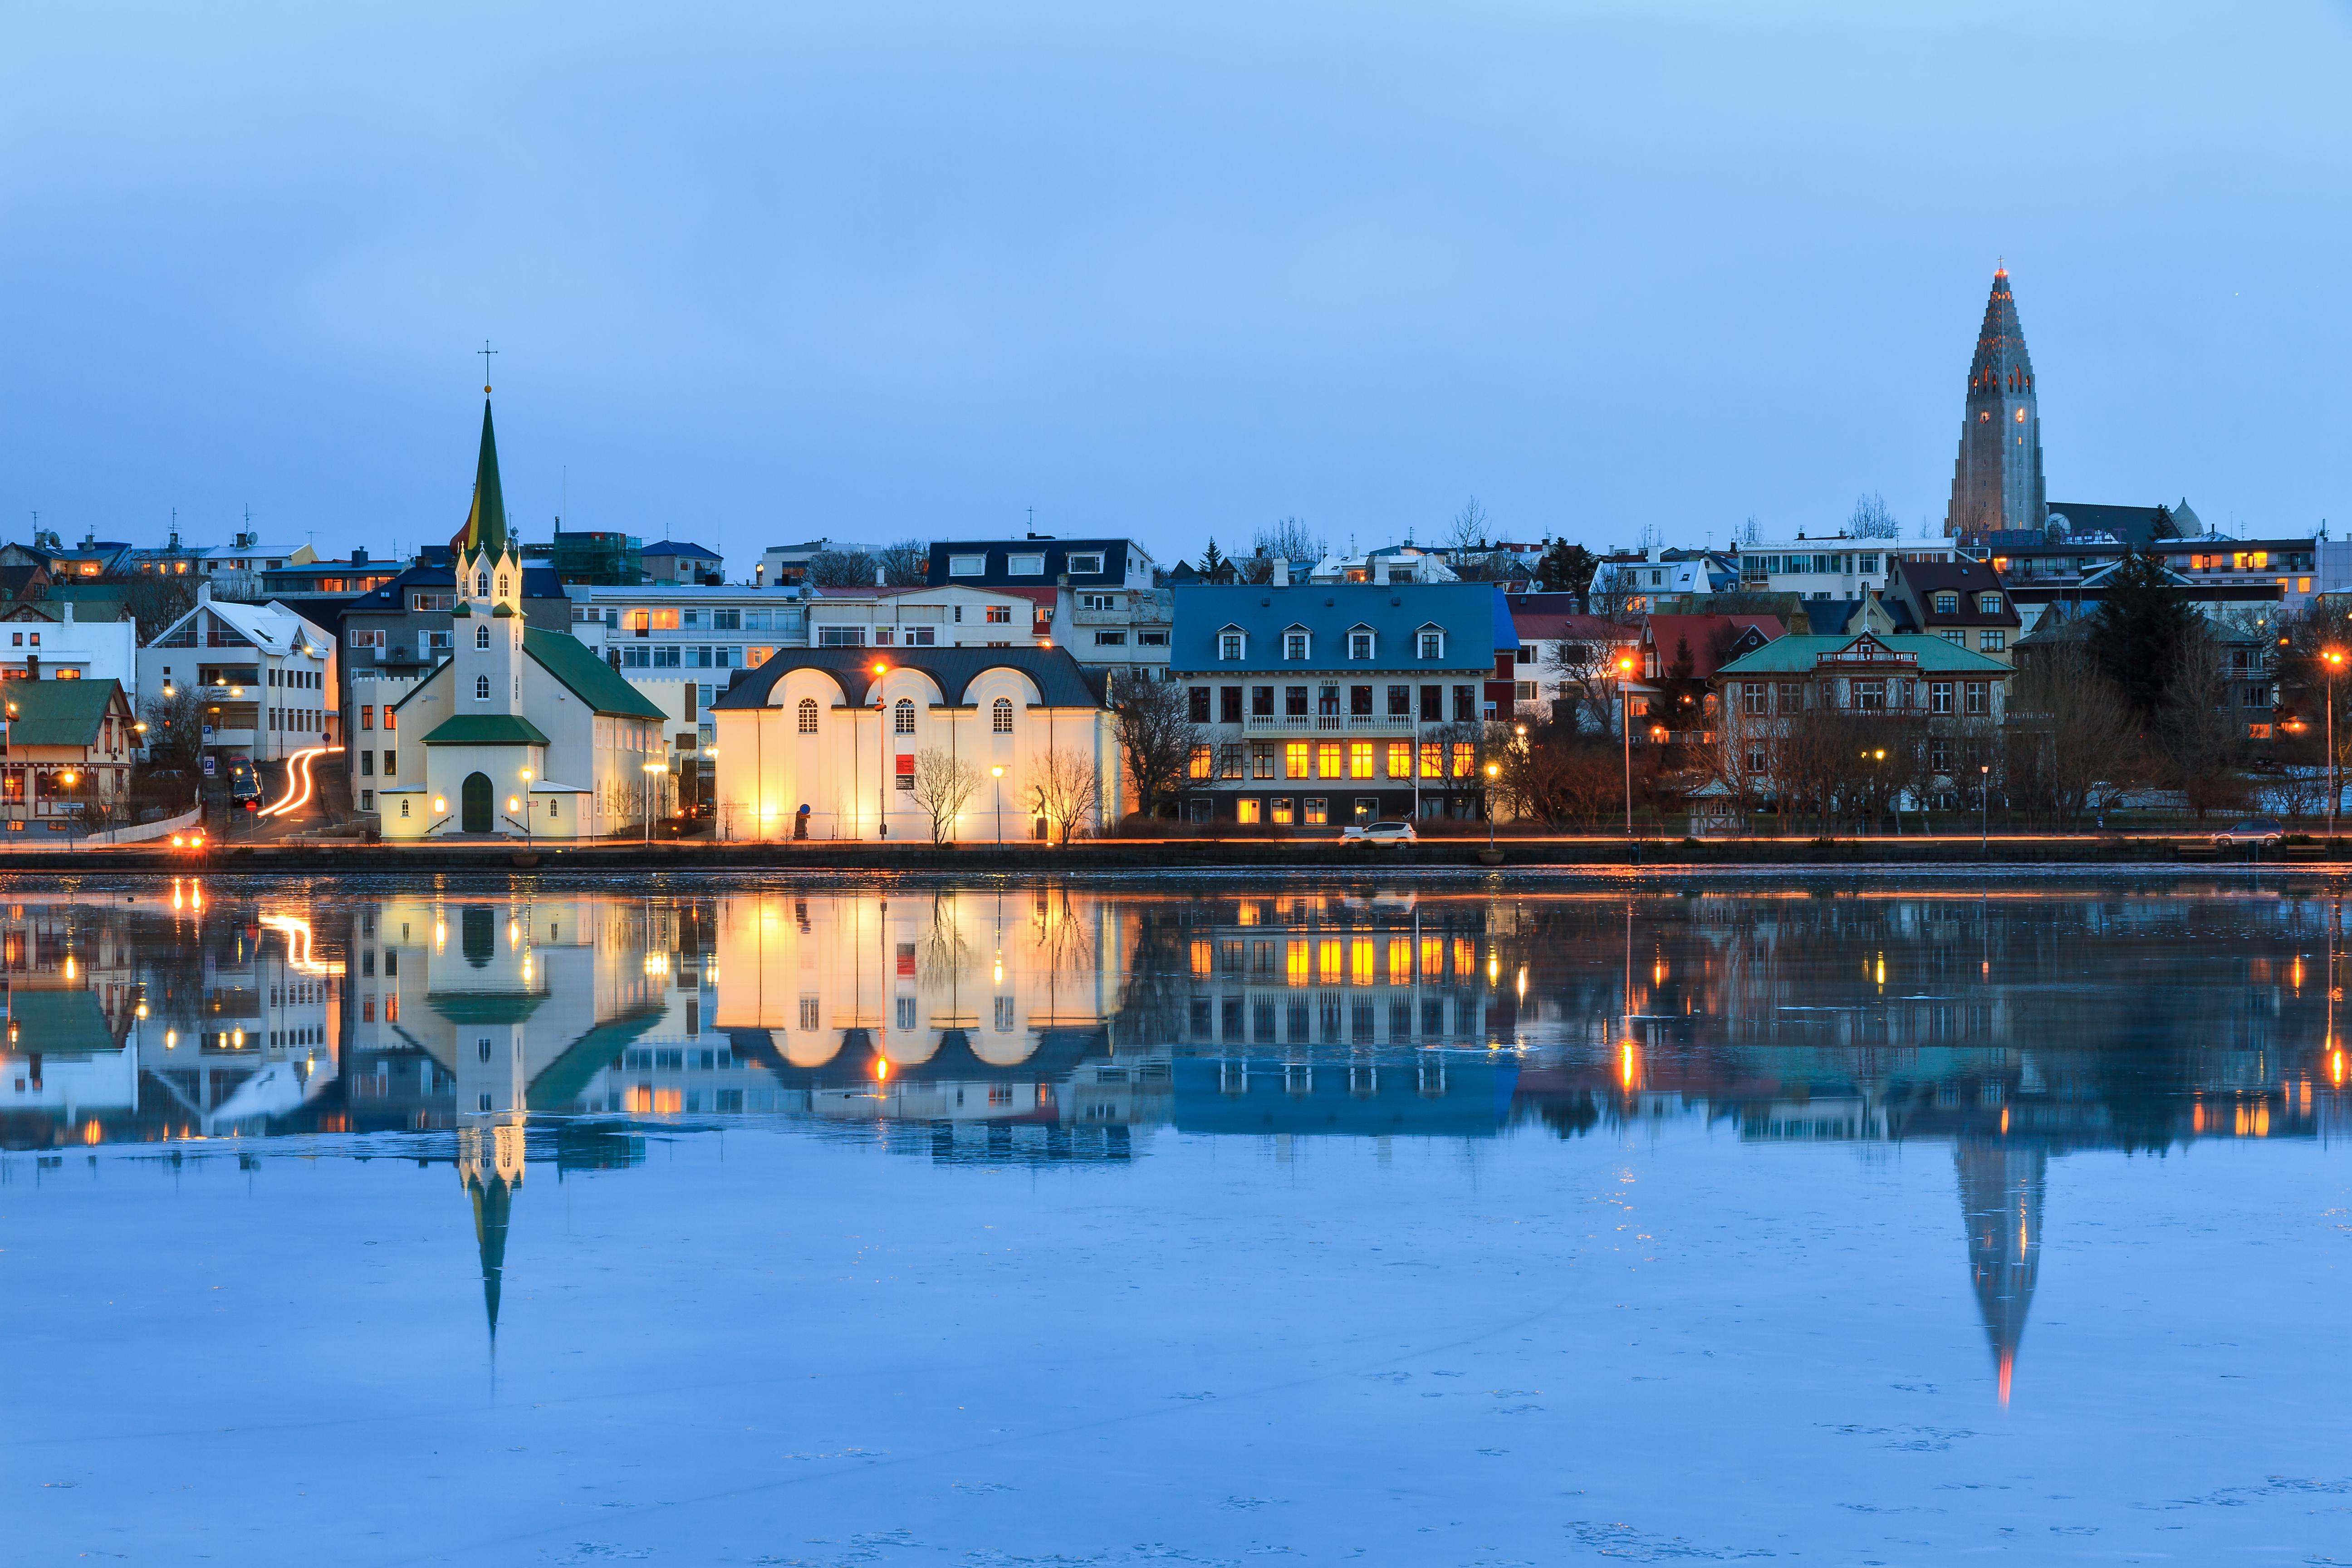 The cityscape of Reykjavik is reflected in lake Tjornin in winter. (Getty)